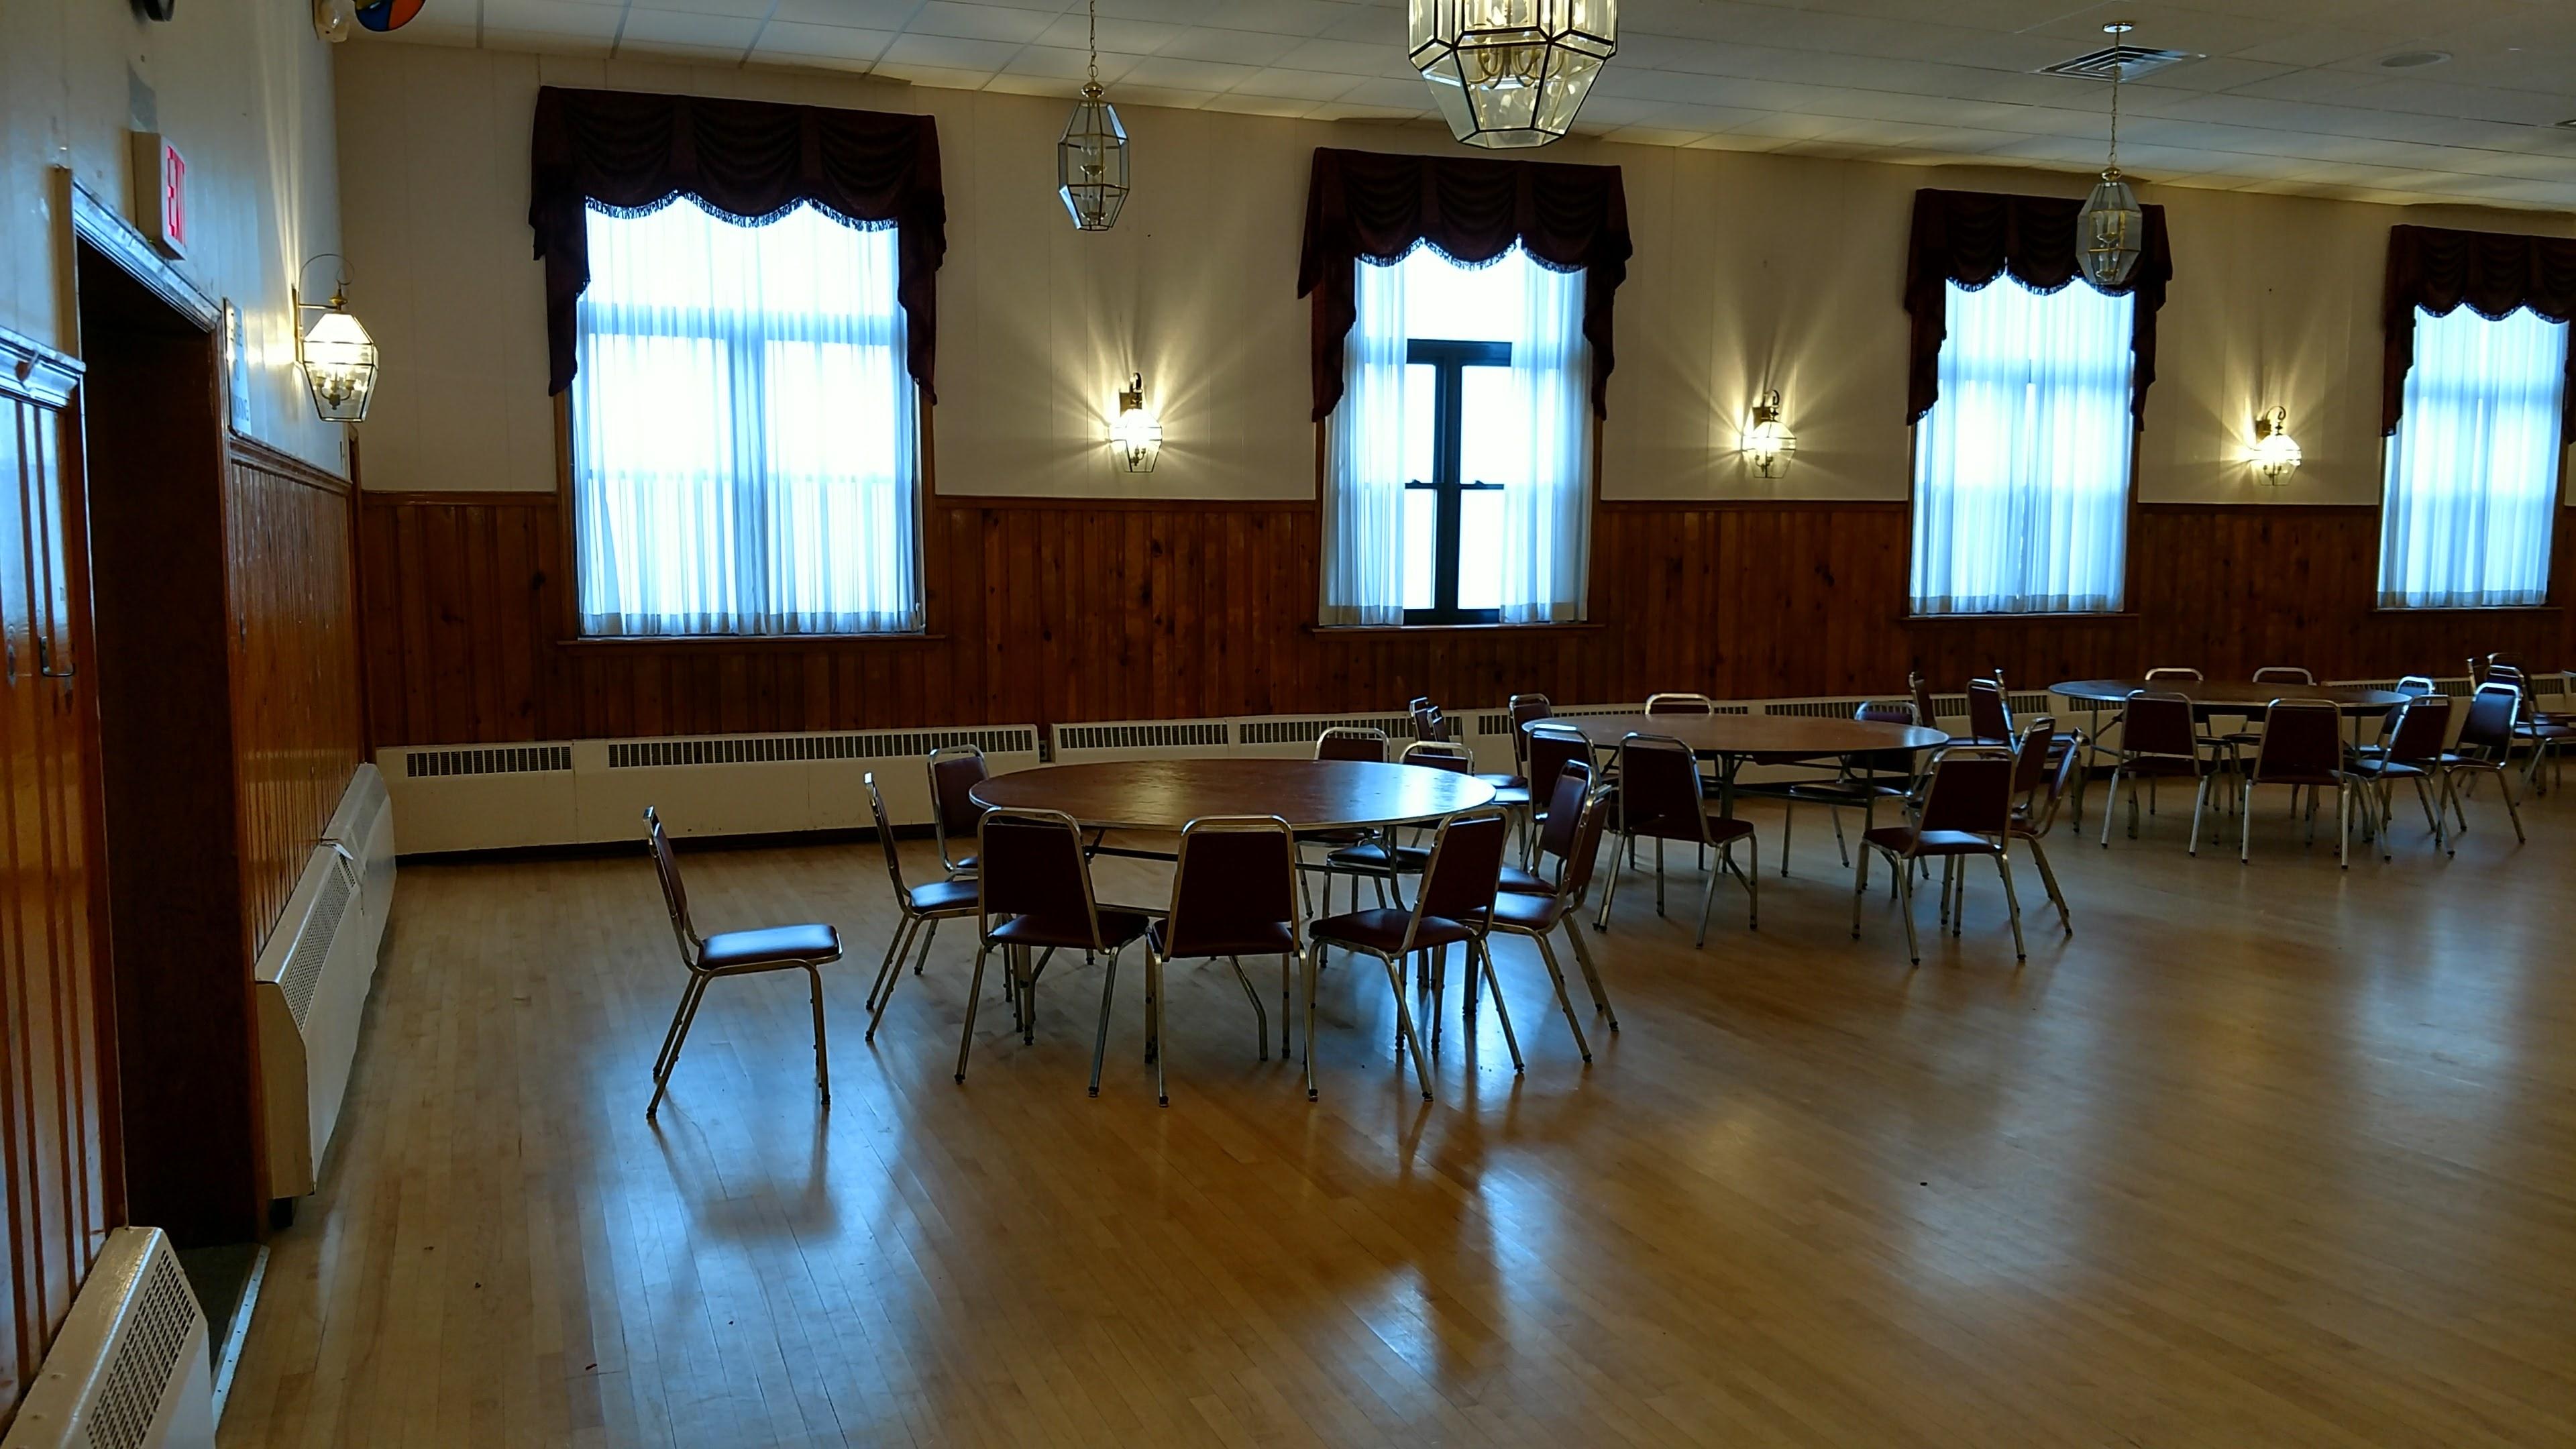 St Michaels Mutual Club Hall Rentals In Gibbstown Nj